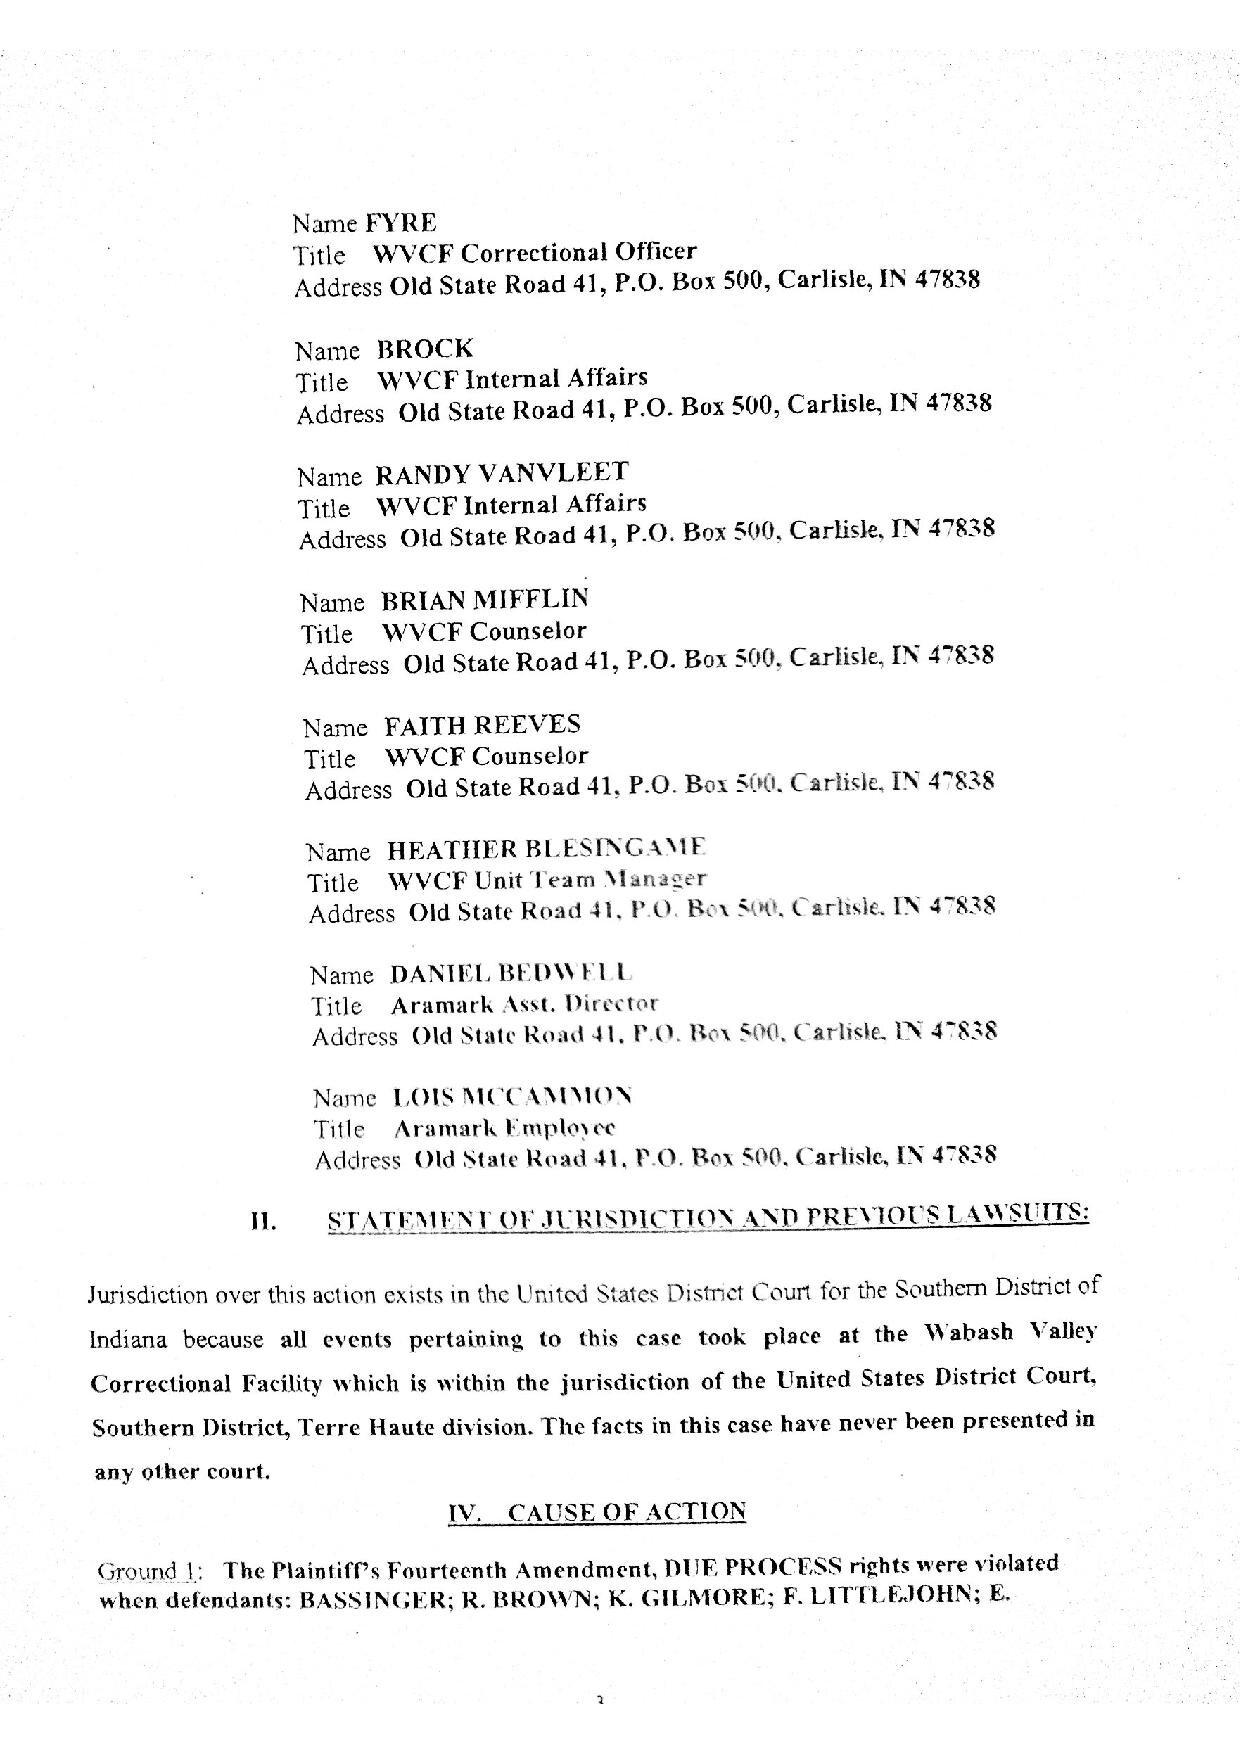 Khalfani lawsuit-page-003.jpg